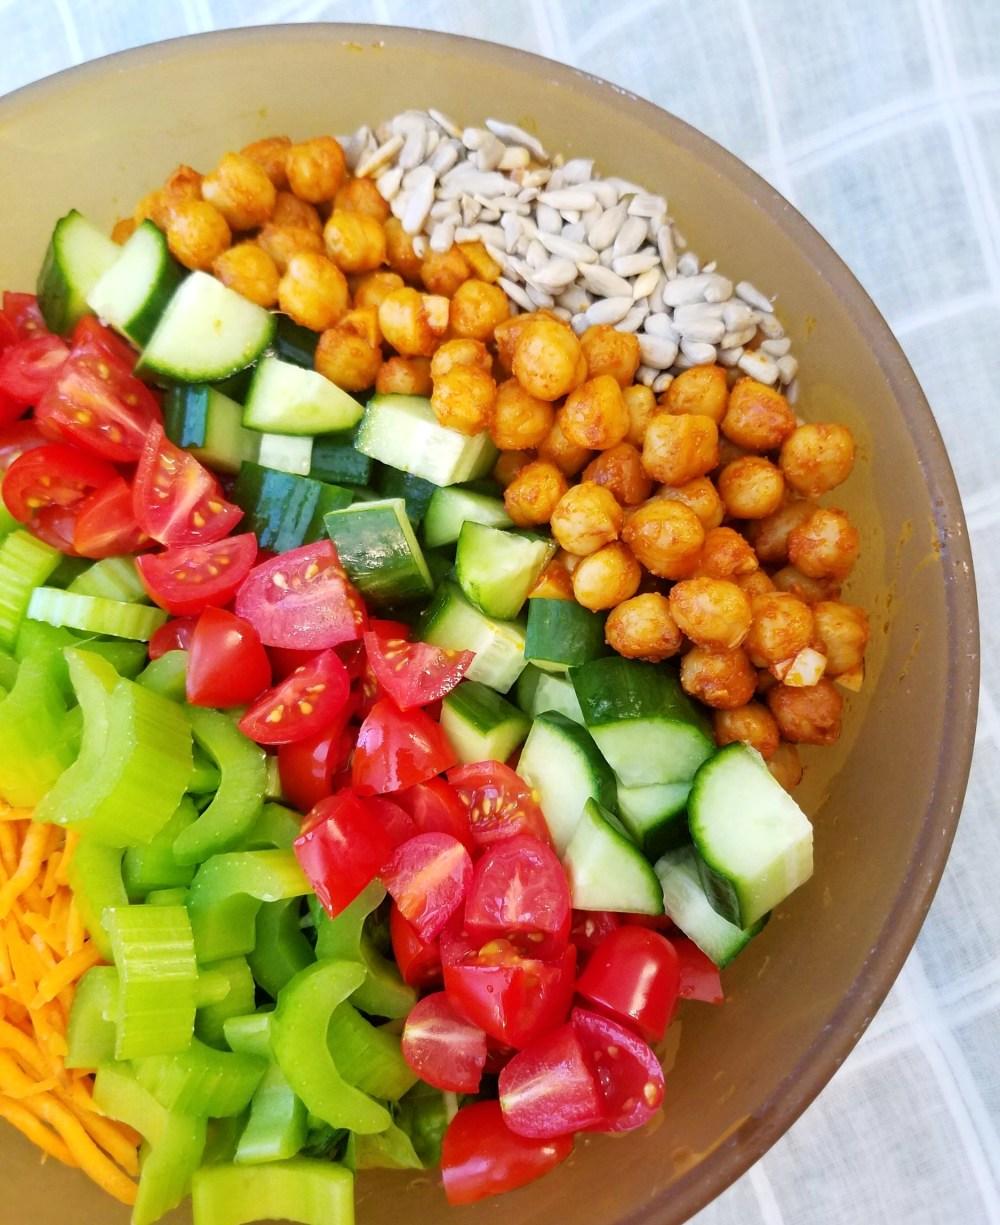 Vegan Chickpea Kale Salad Recipe